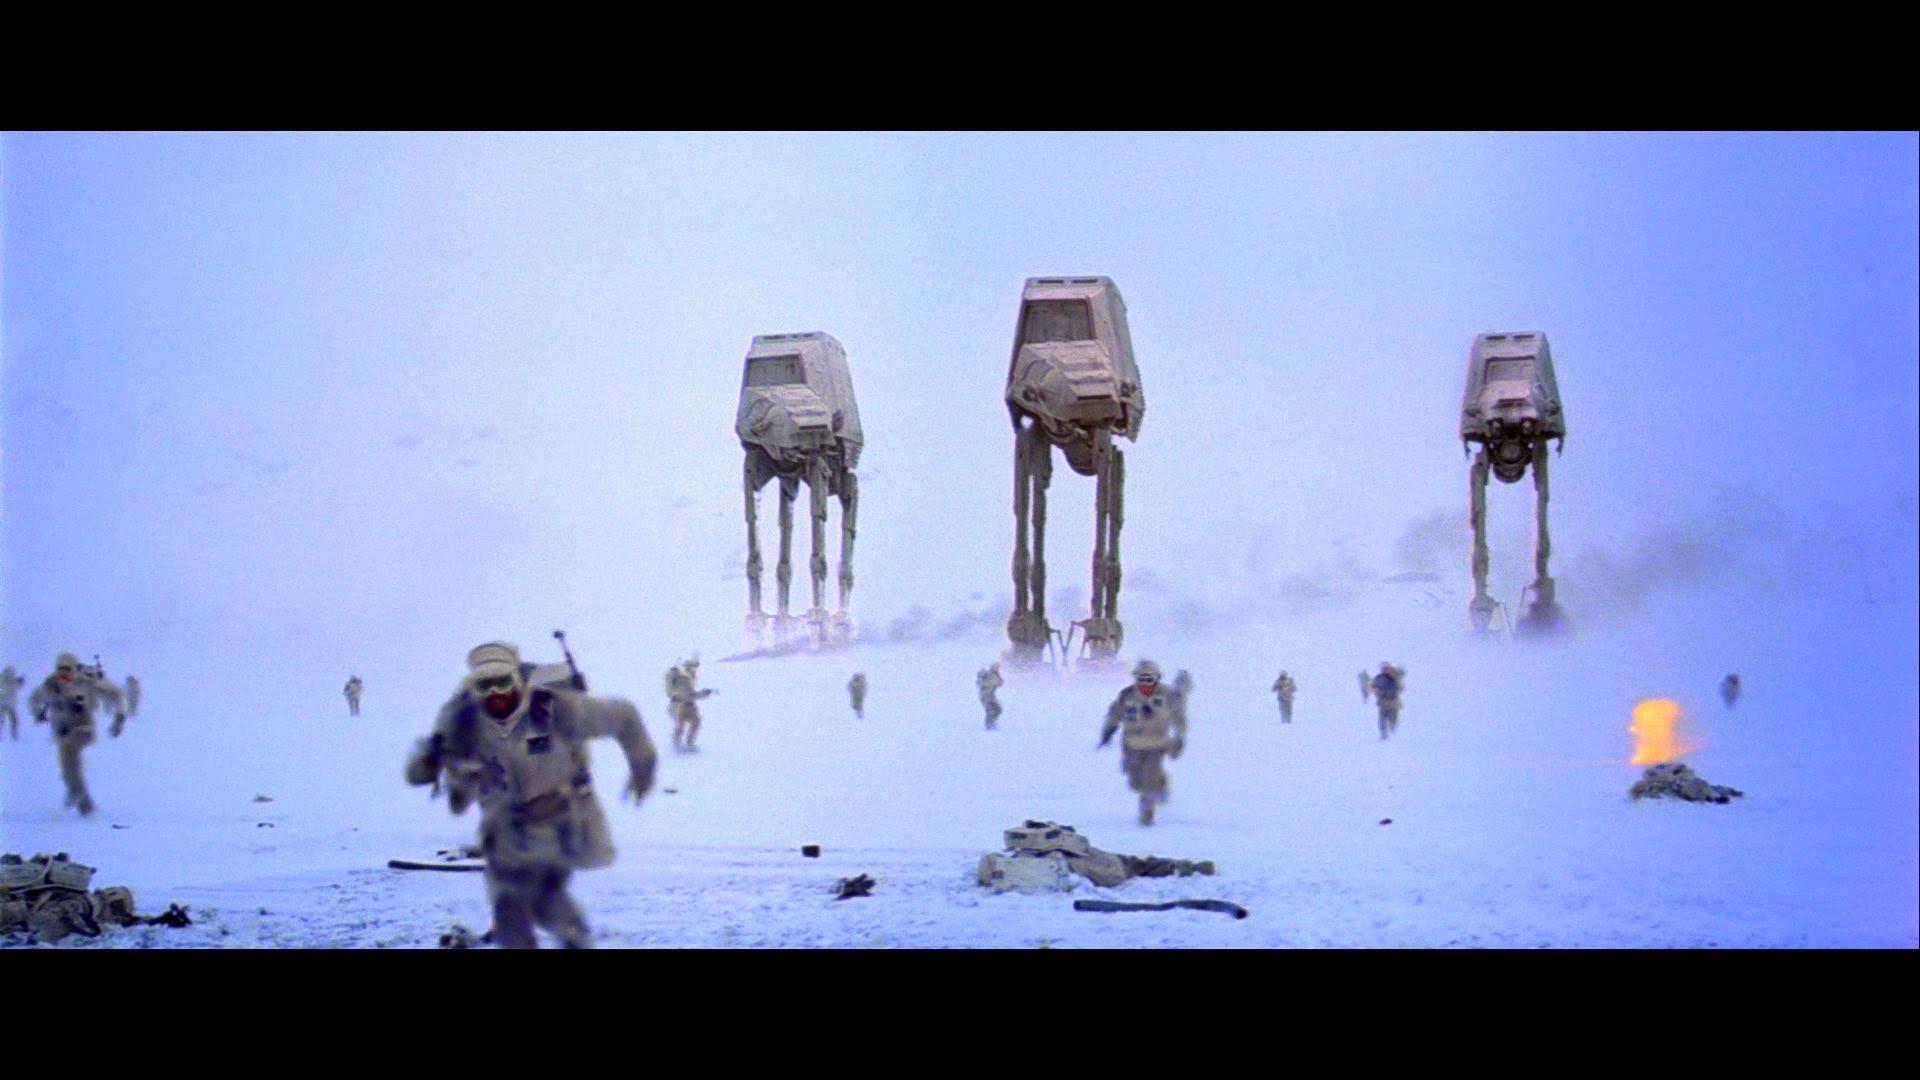 Empire Strikes Back Wallpaper Sf Wallpaper